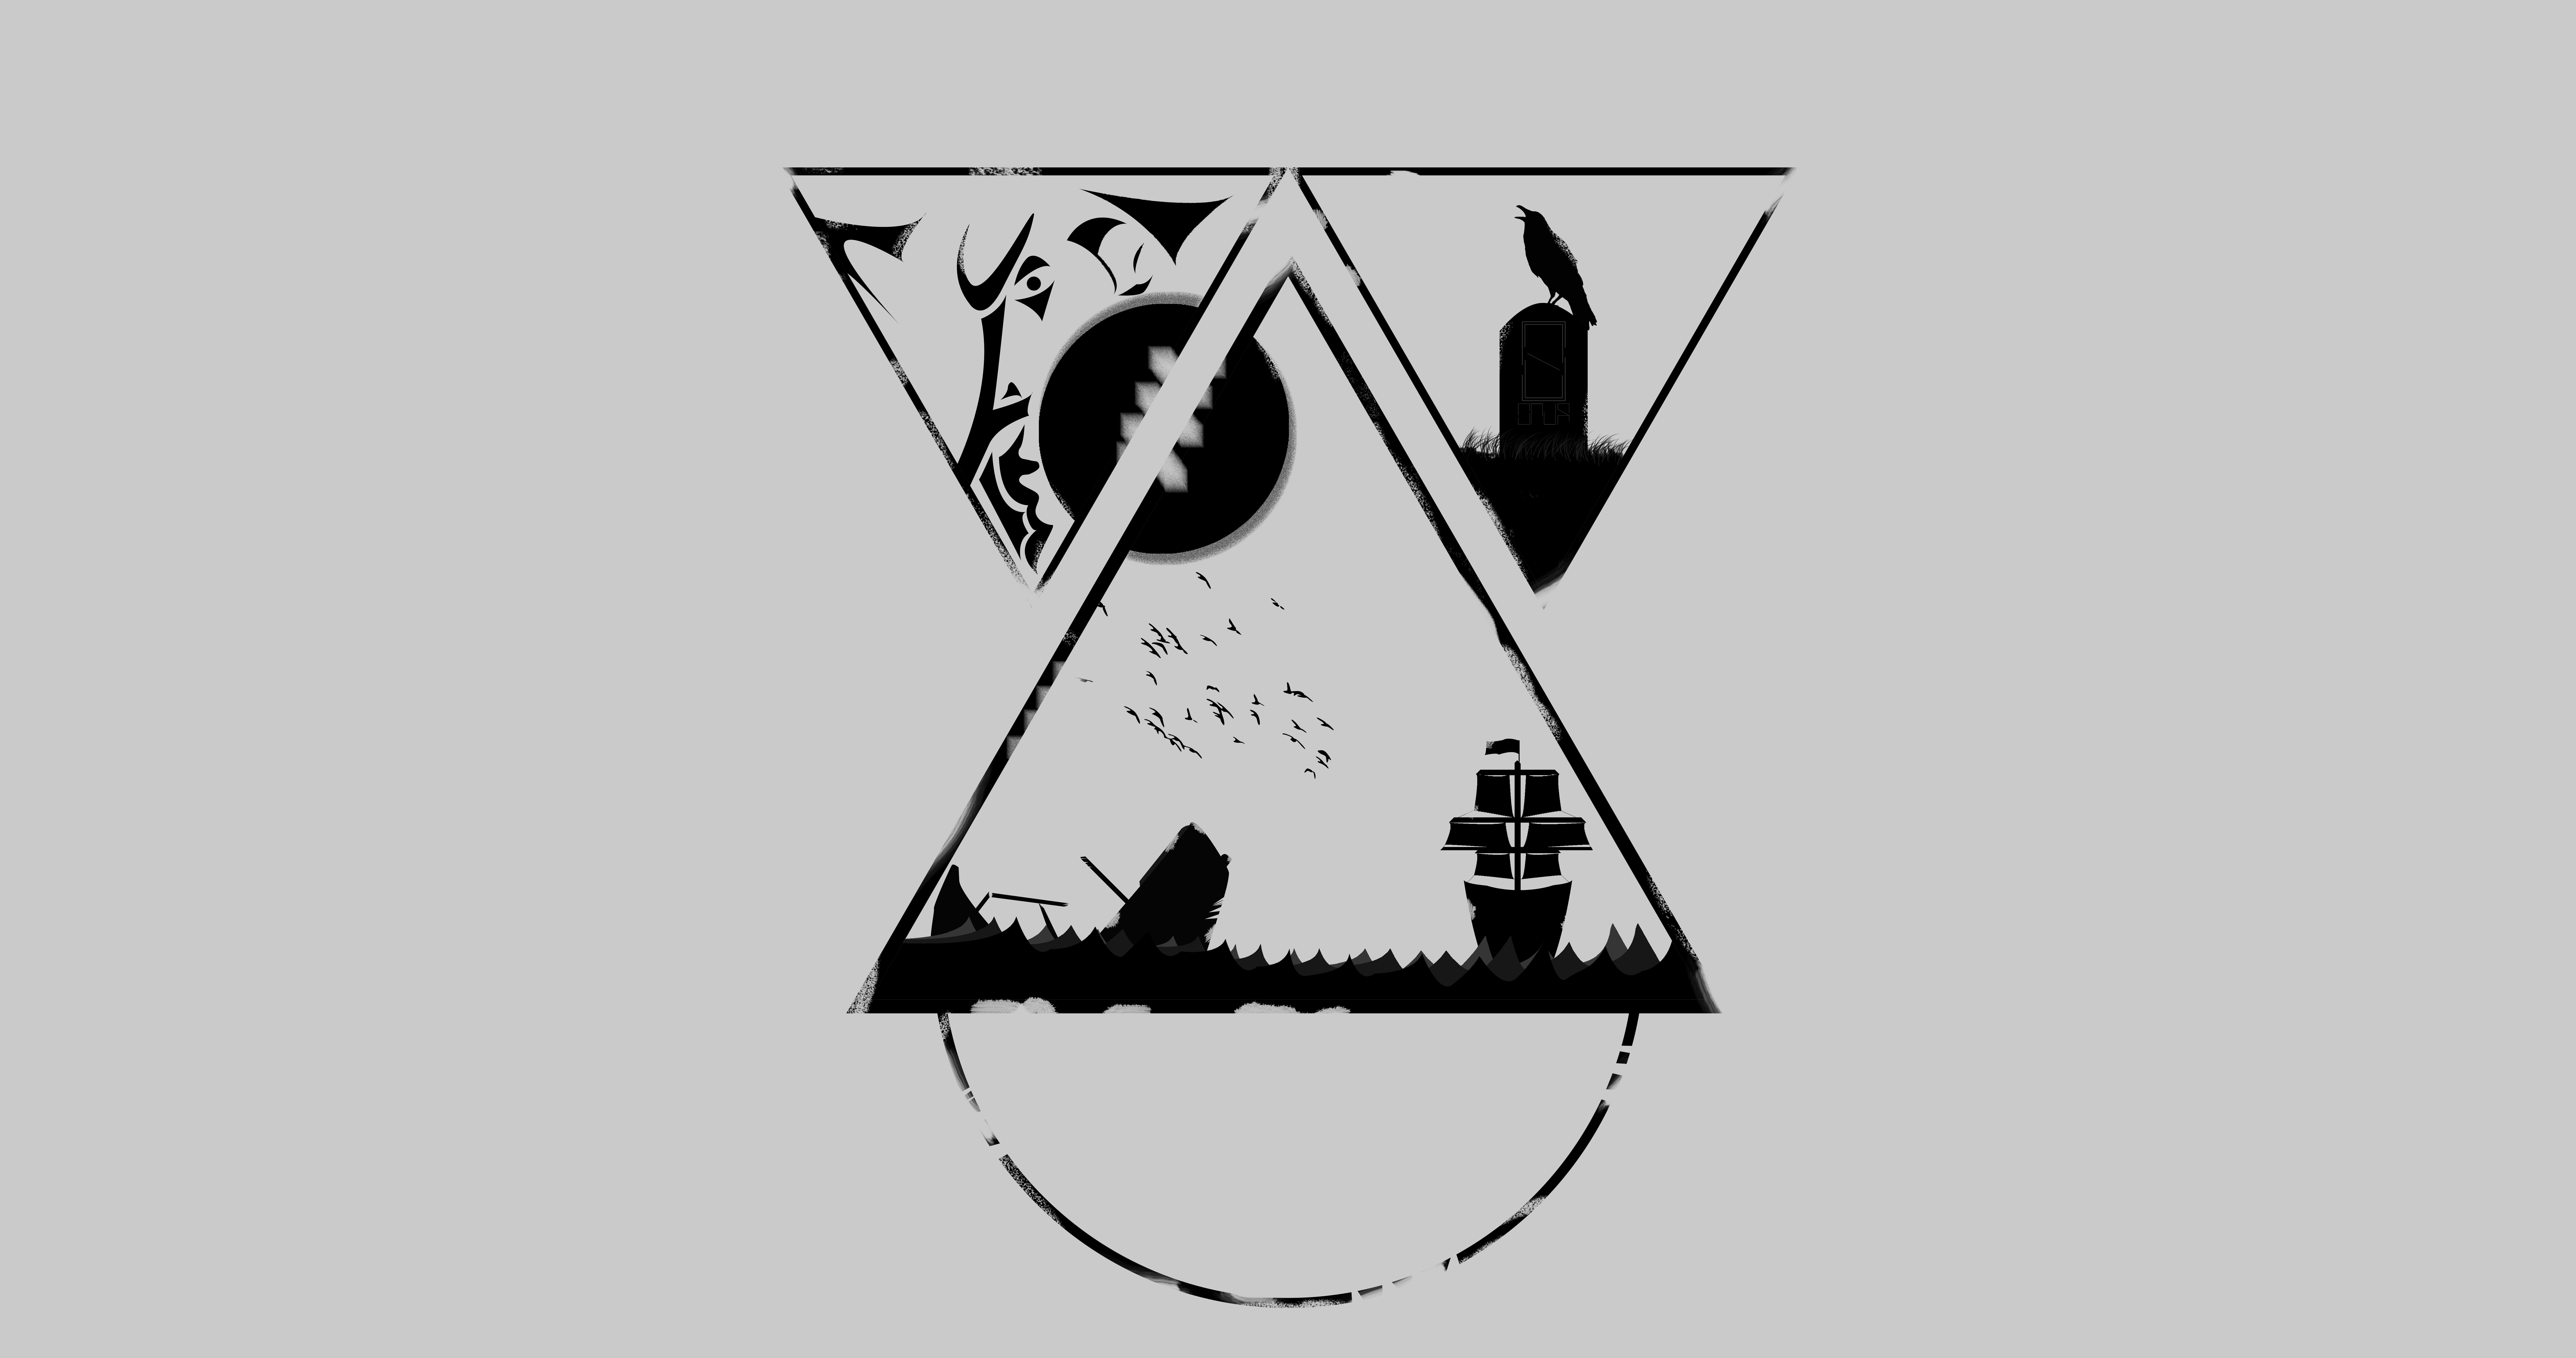 Minimalism Simple Simple Background White Triangle Geometric Figures Geometry Black Ship Sea Raven C 8192x4320